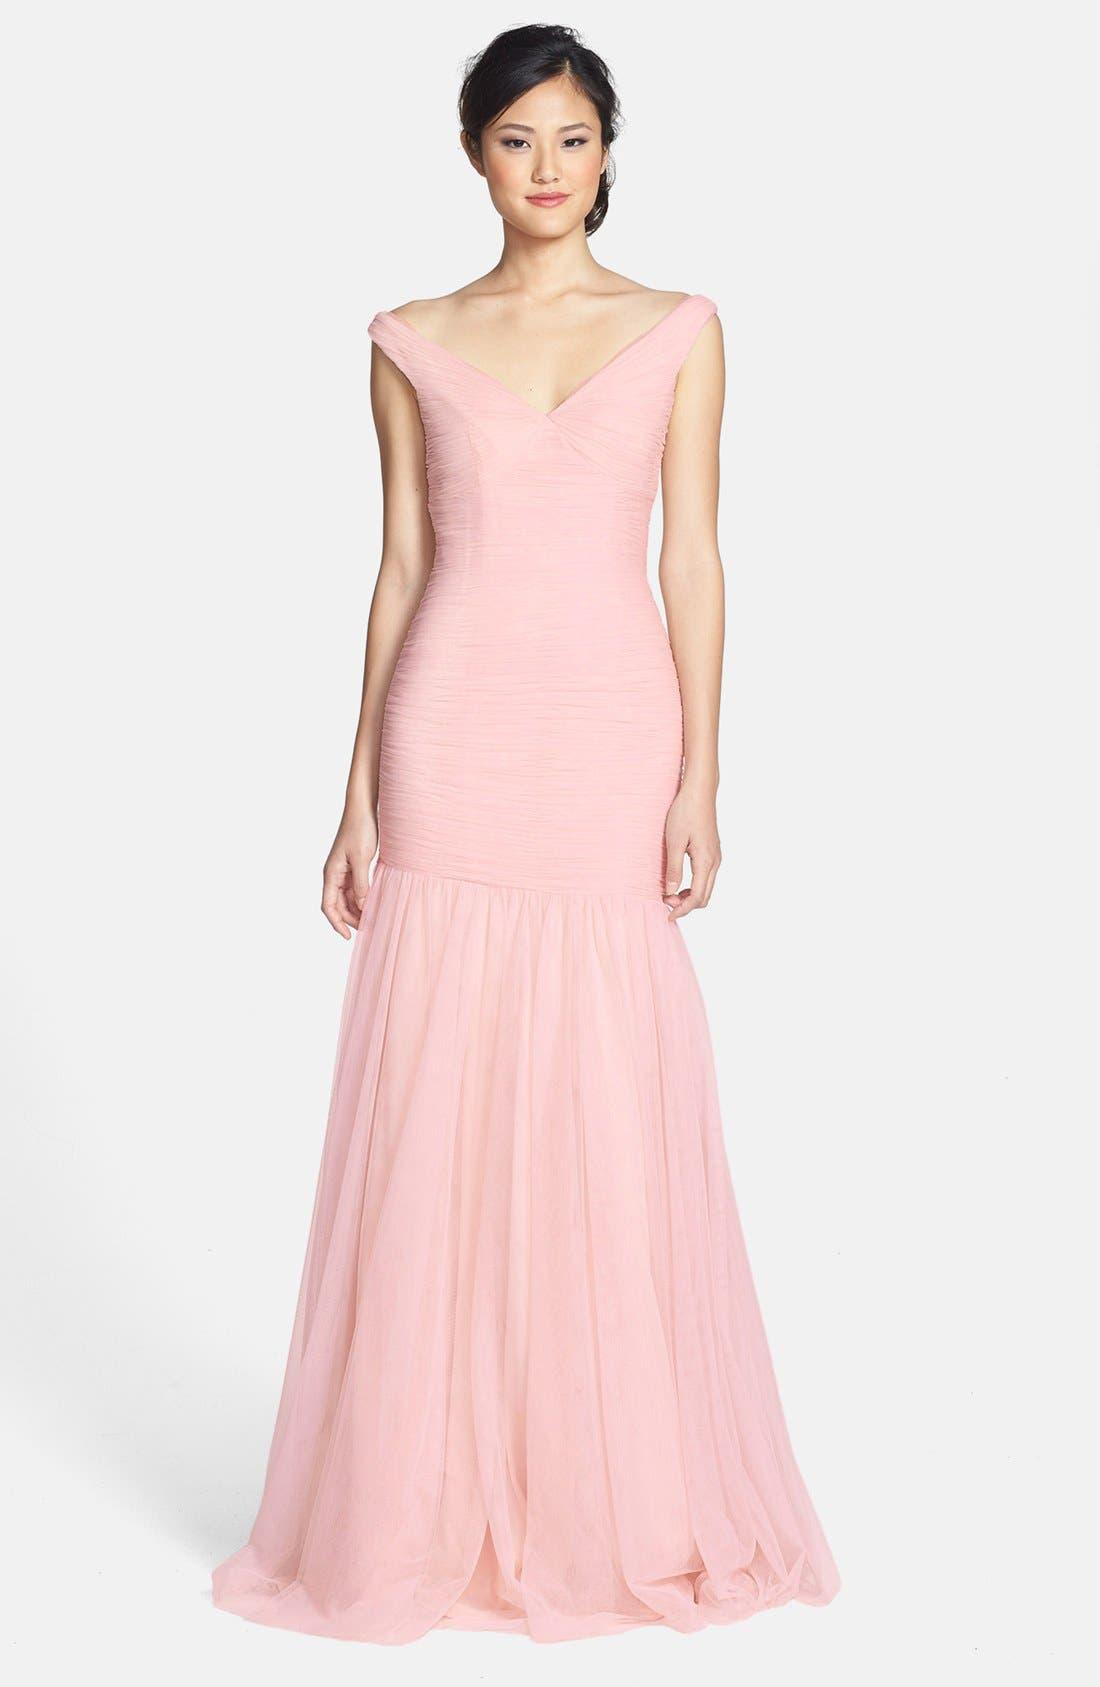 Main Image - Monique Lhuillier Bridesmaids V-Neck Shirred Tulle Trumpet Dress